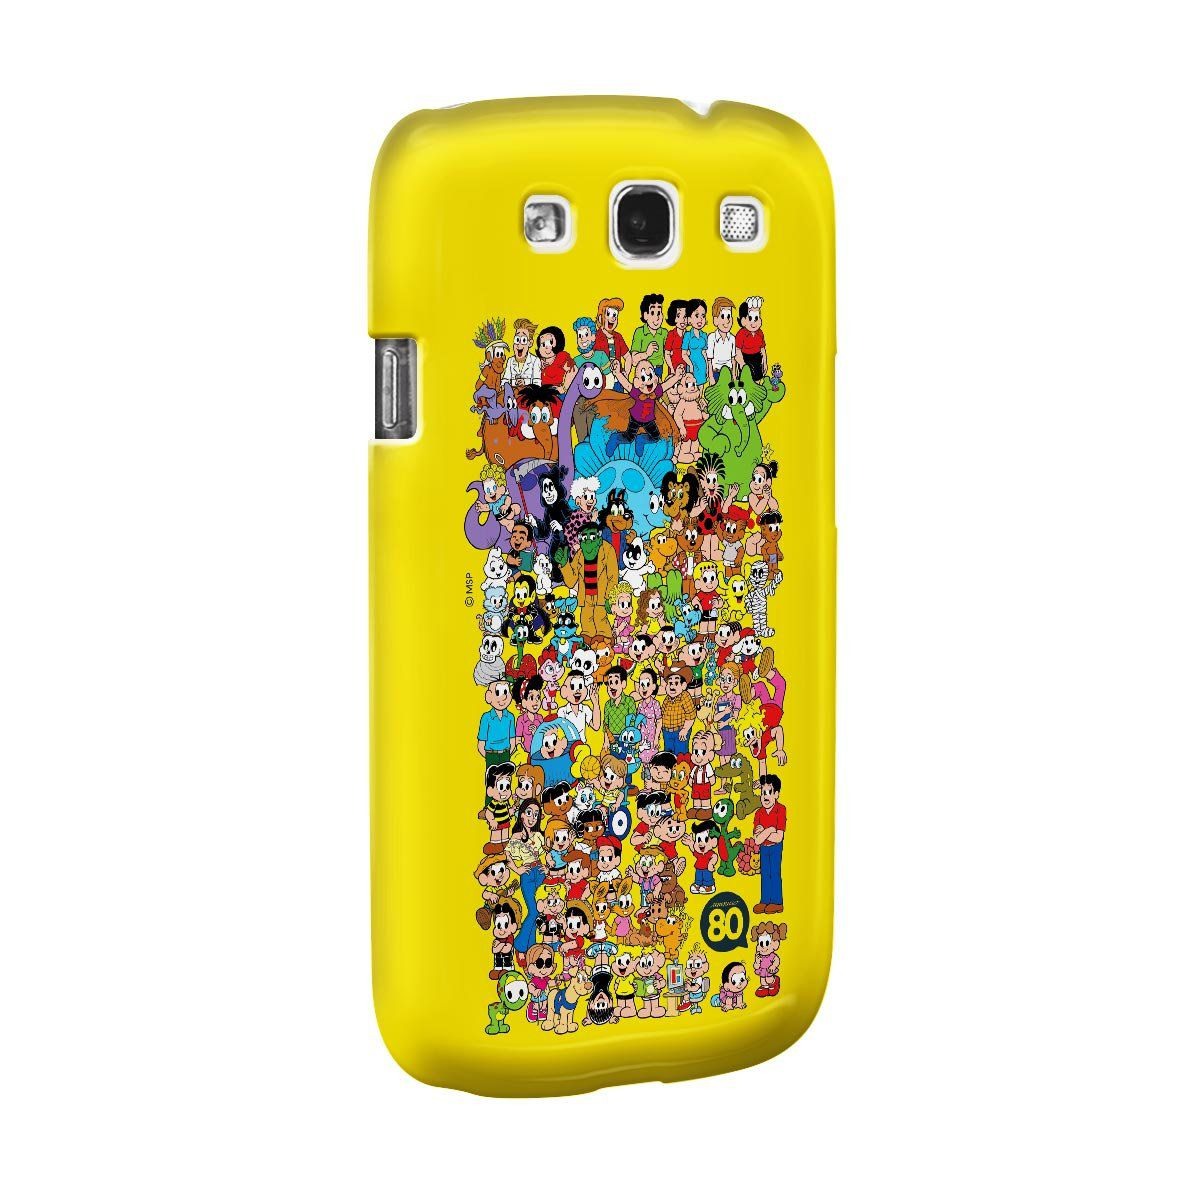 Capa para Samsung Galaxy S3 Maurício de Sousa 80 Anos